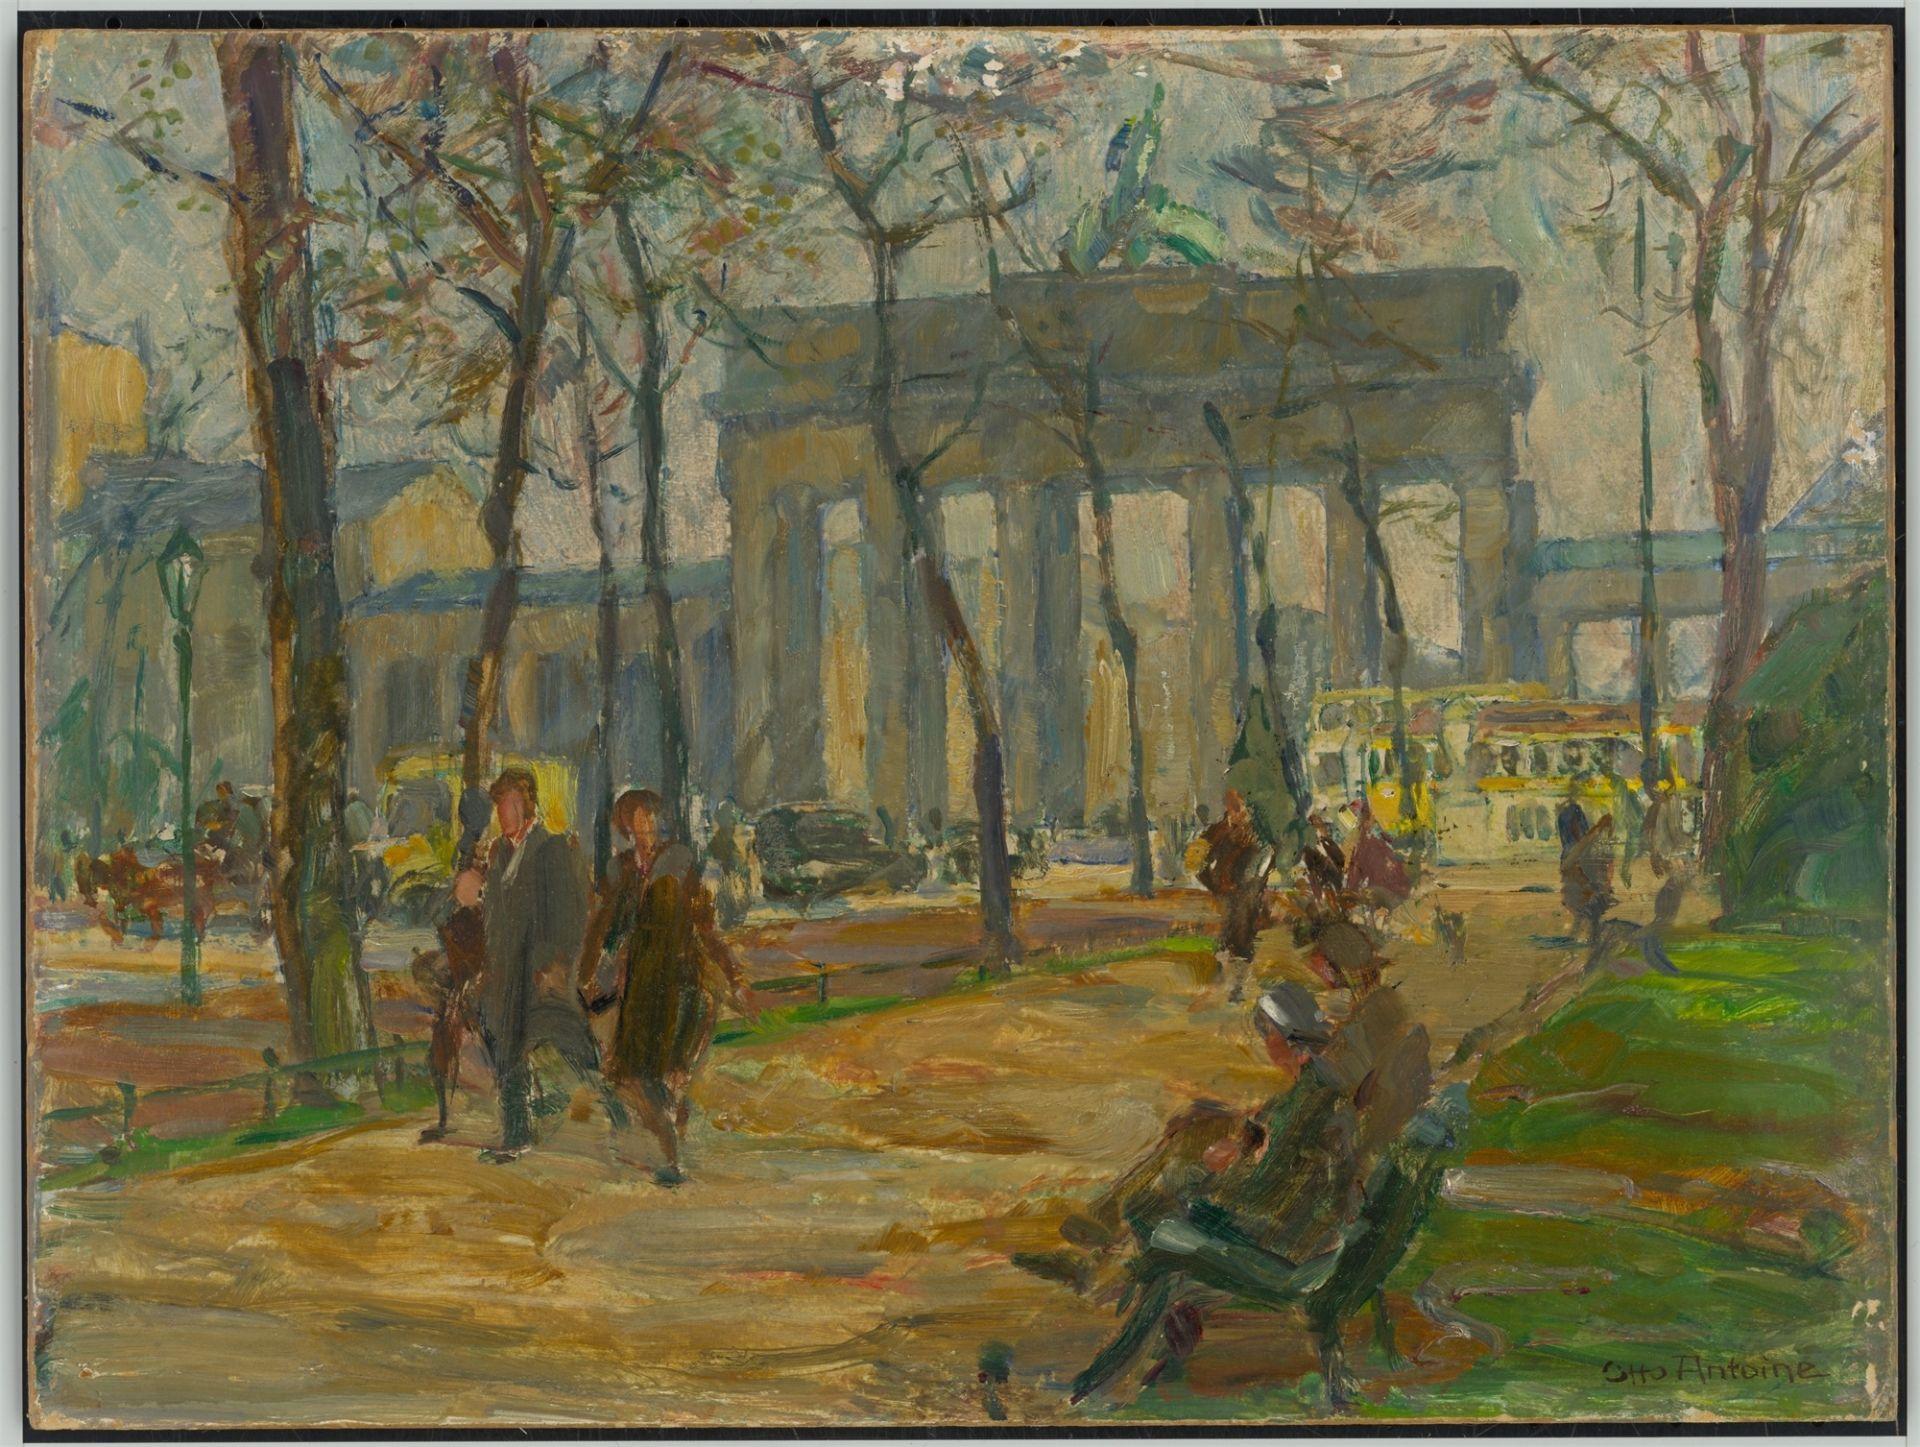 Otto Antoine. Brandenburg Gate. After 1928 - Image 2 of 4